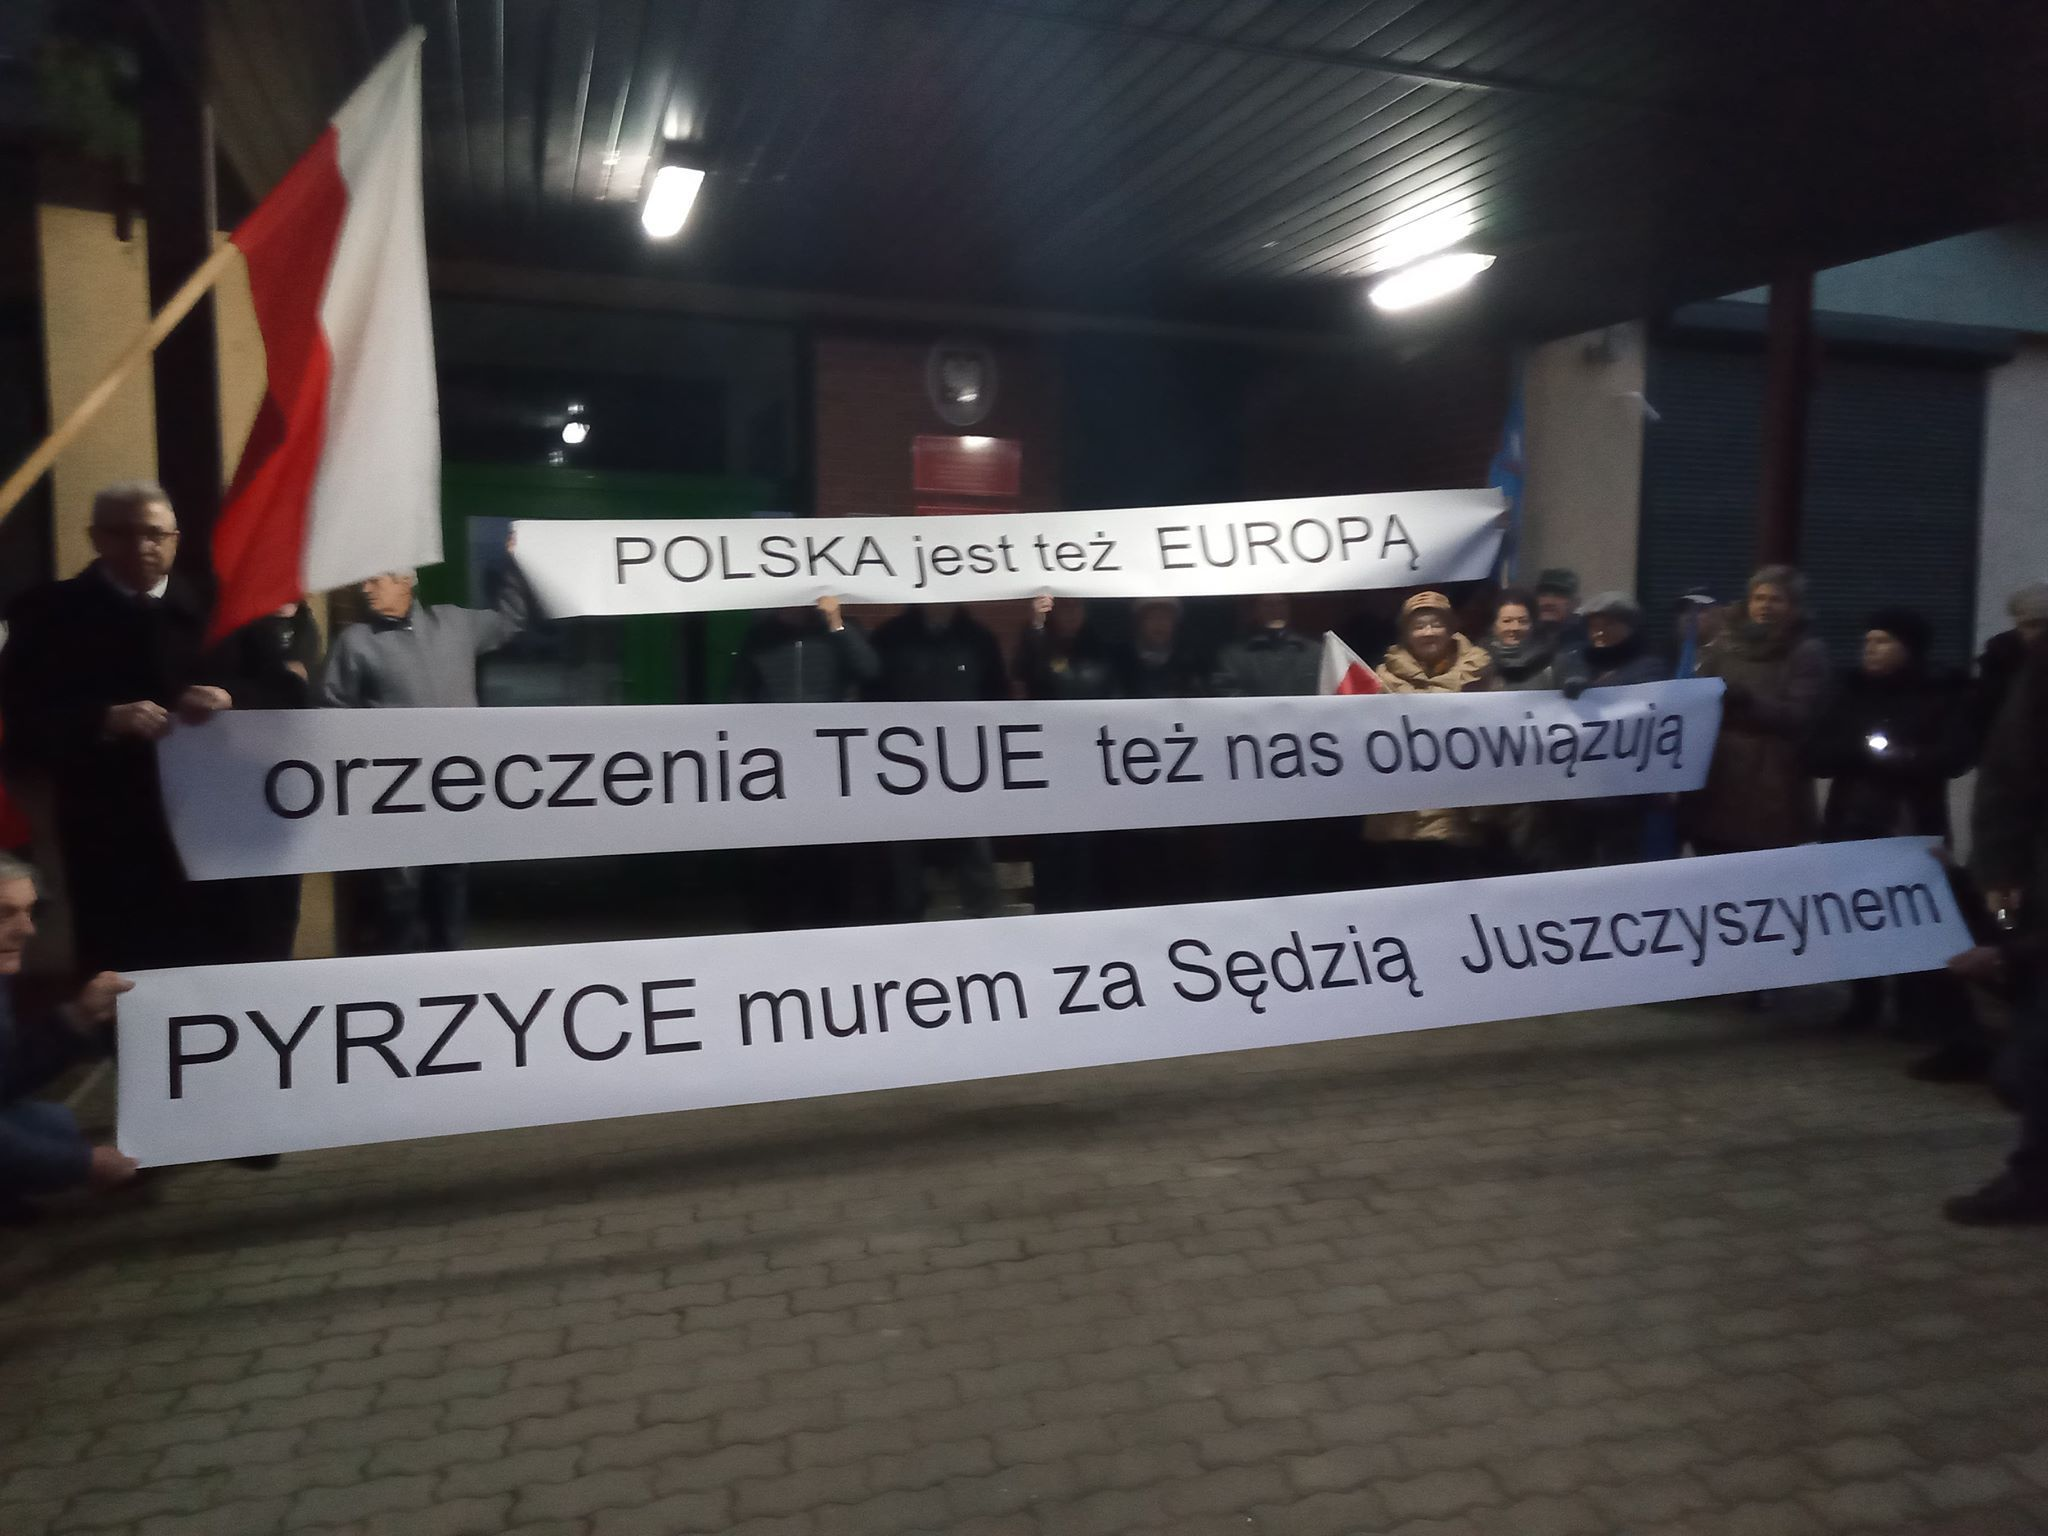 Read more about the article Pyrzyce murem za sędzią